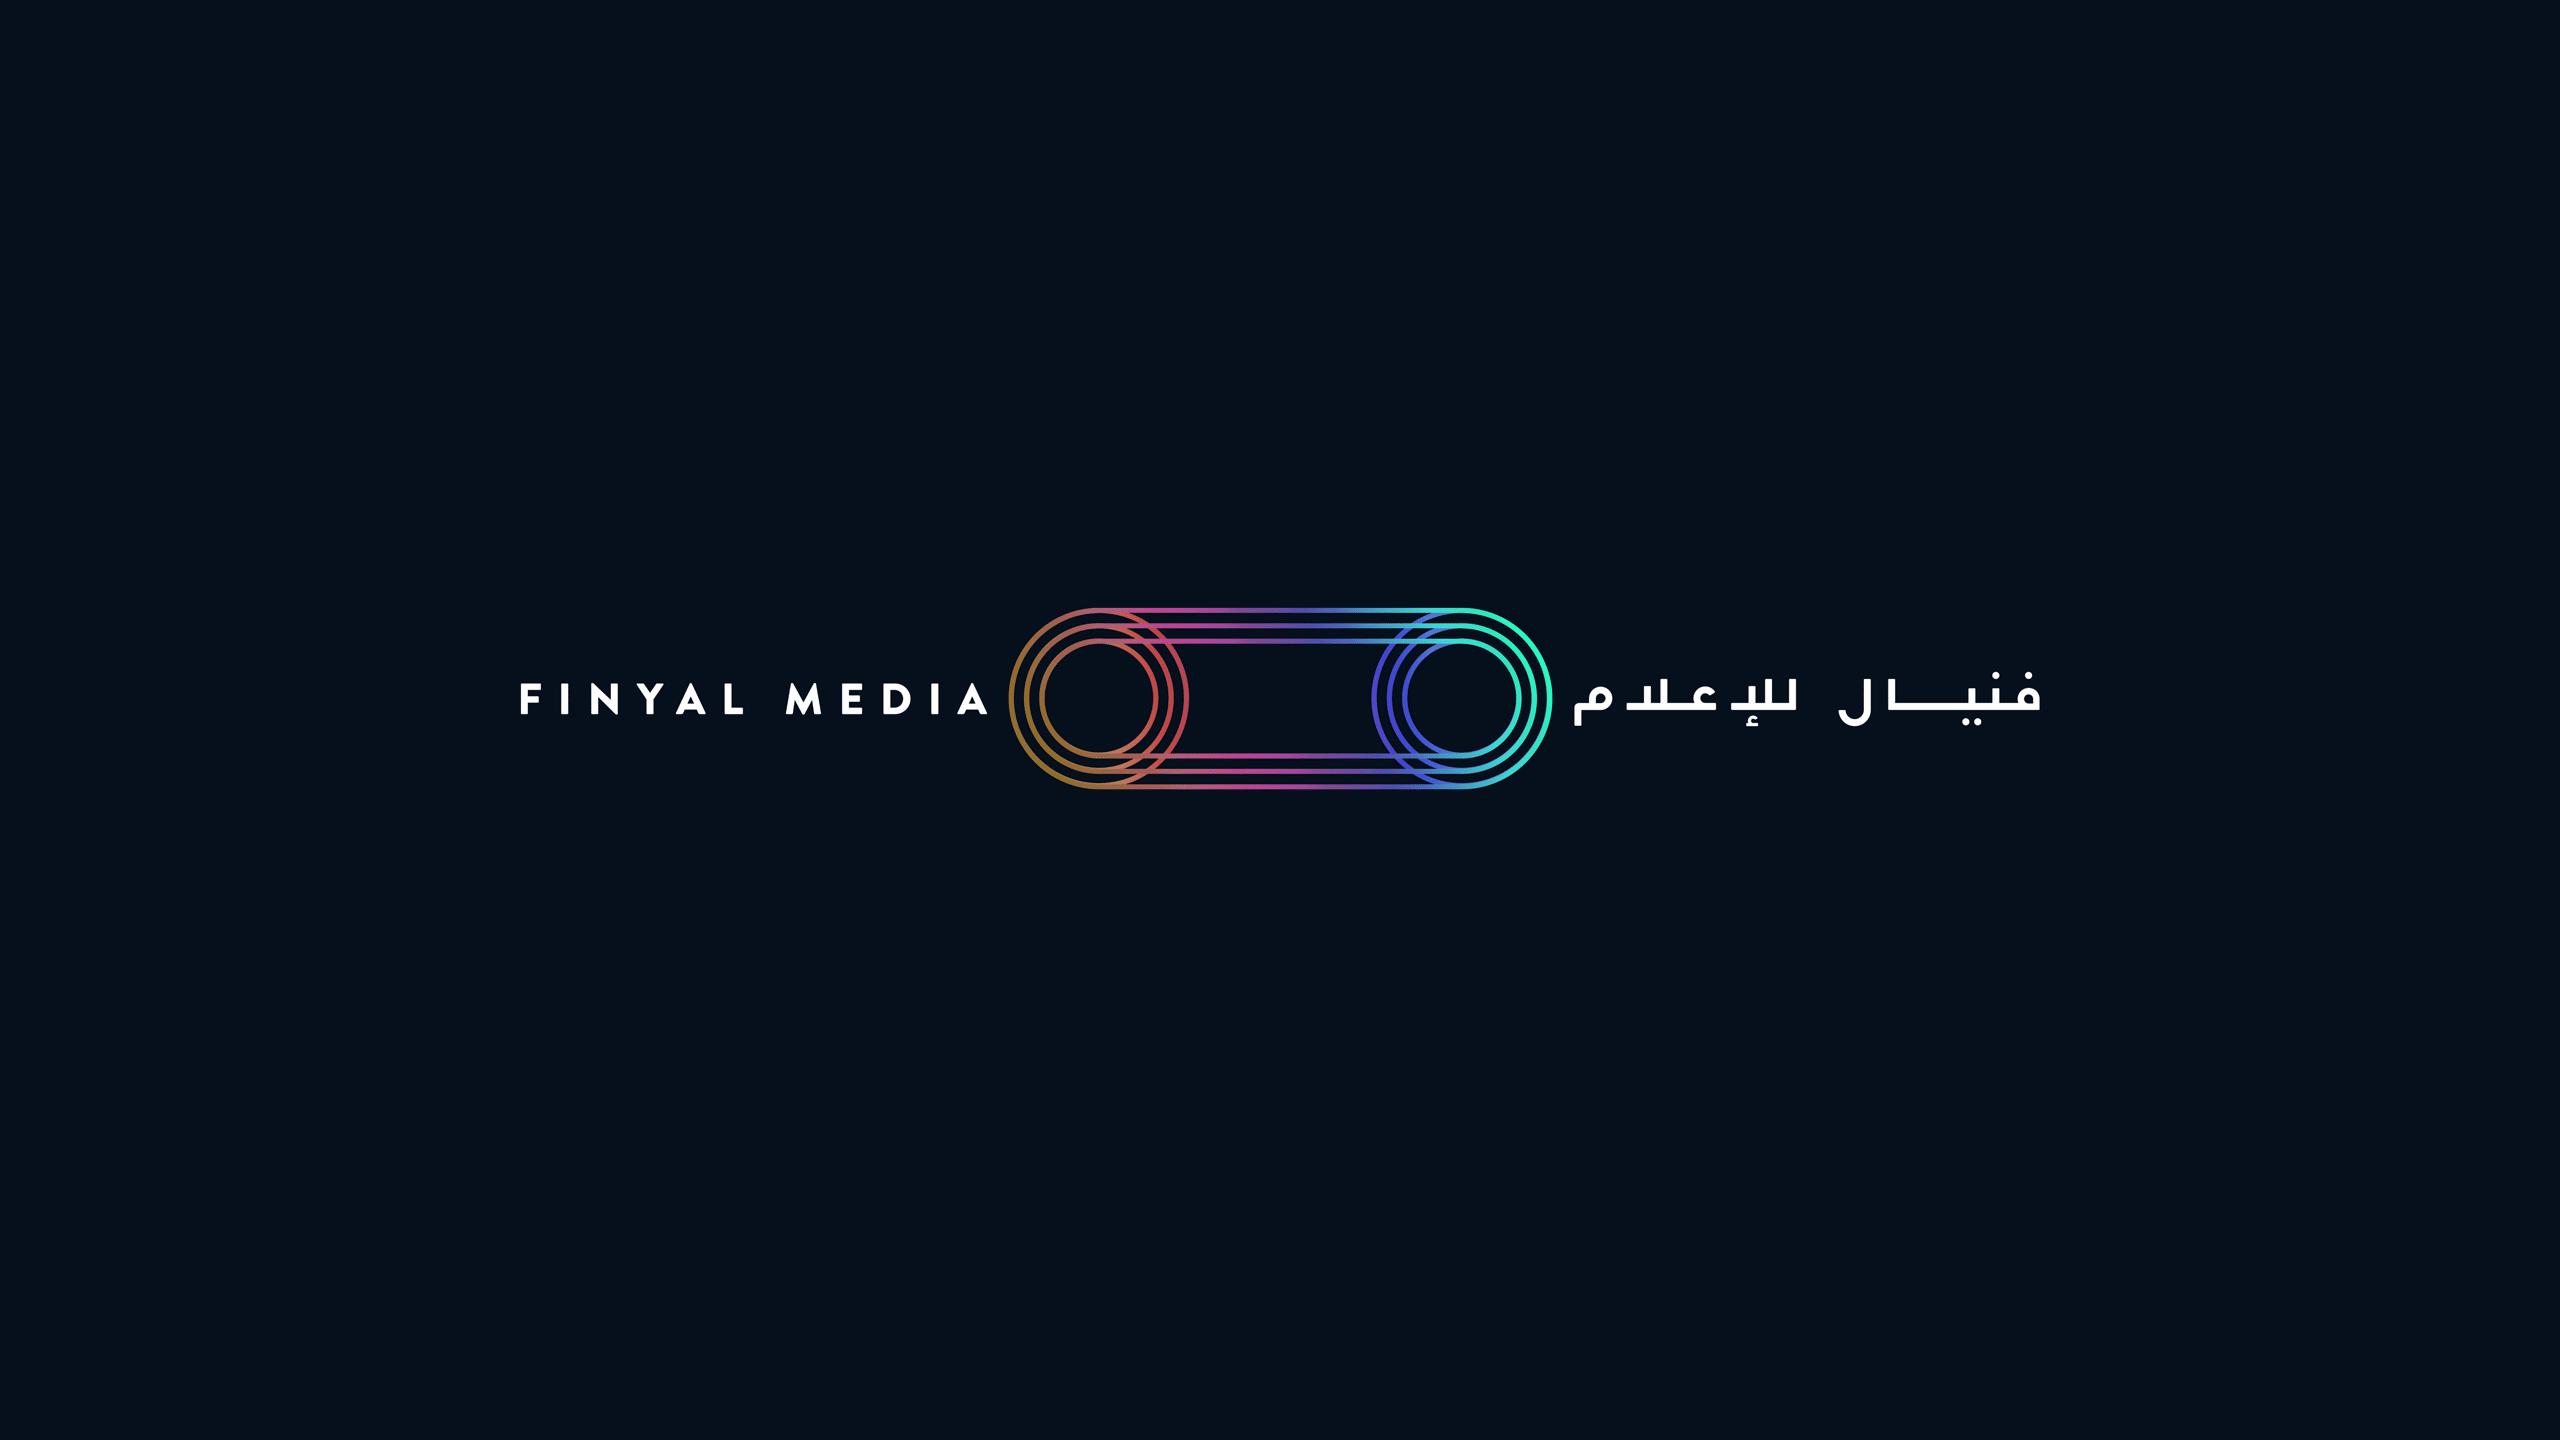 Finyal Media logo